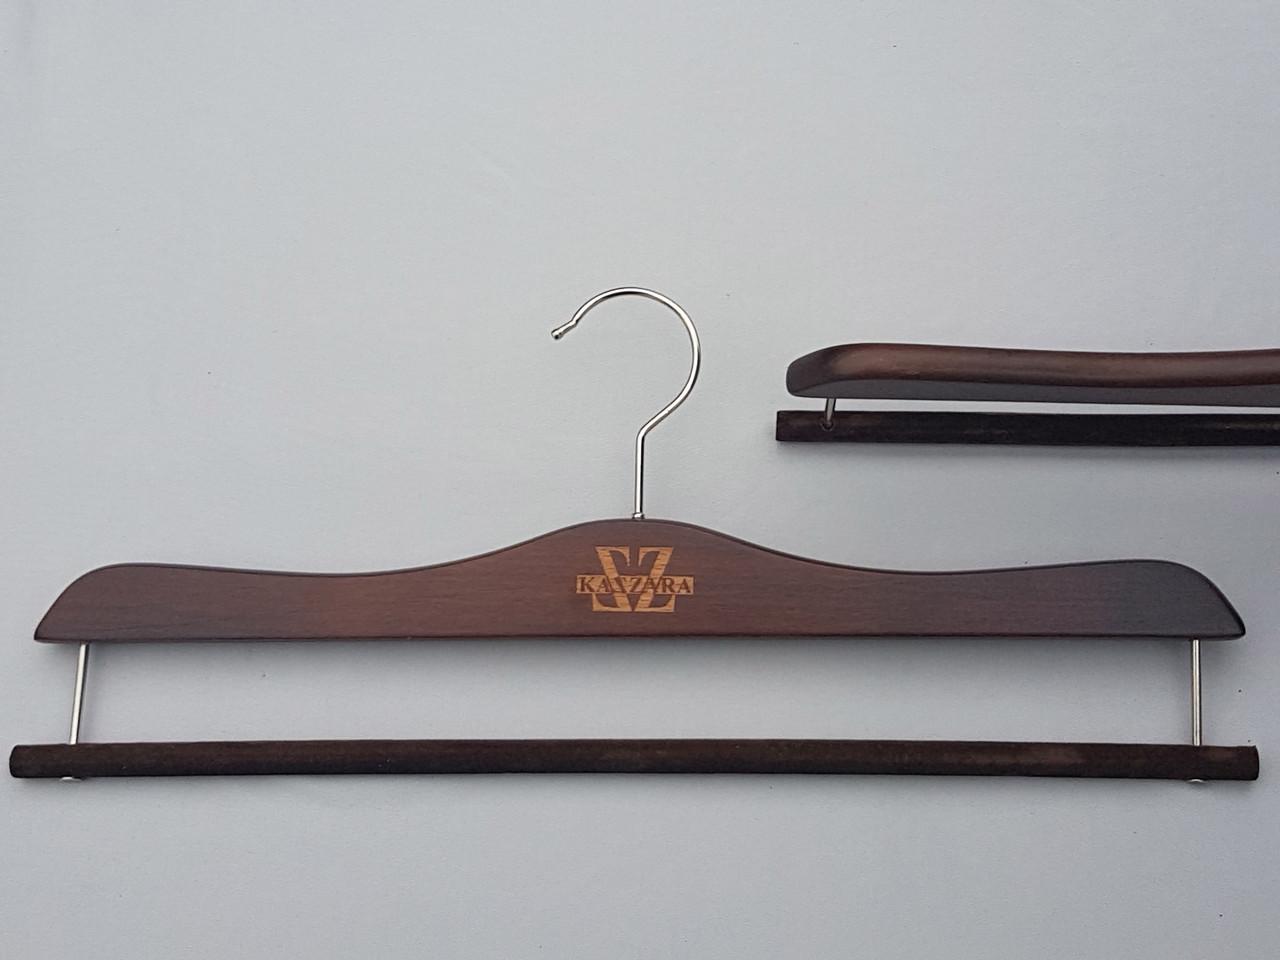 Плечики вешалки деревянные для брюк и юбок Mainetti Kazara коричневого цвета для брюк и юбок, 41 см